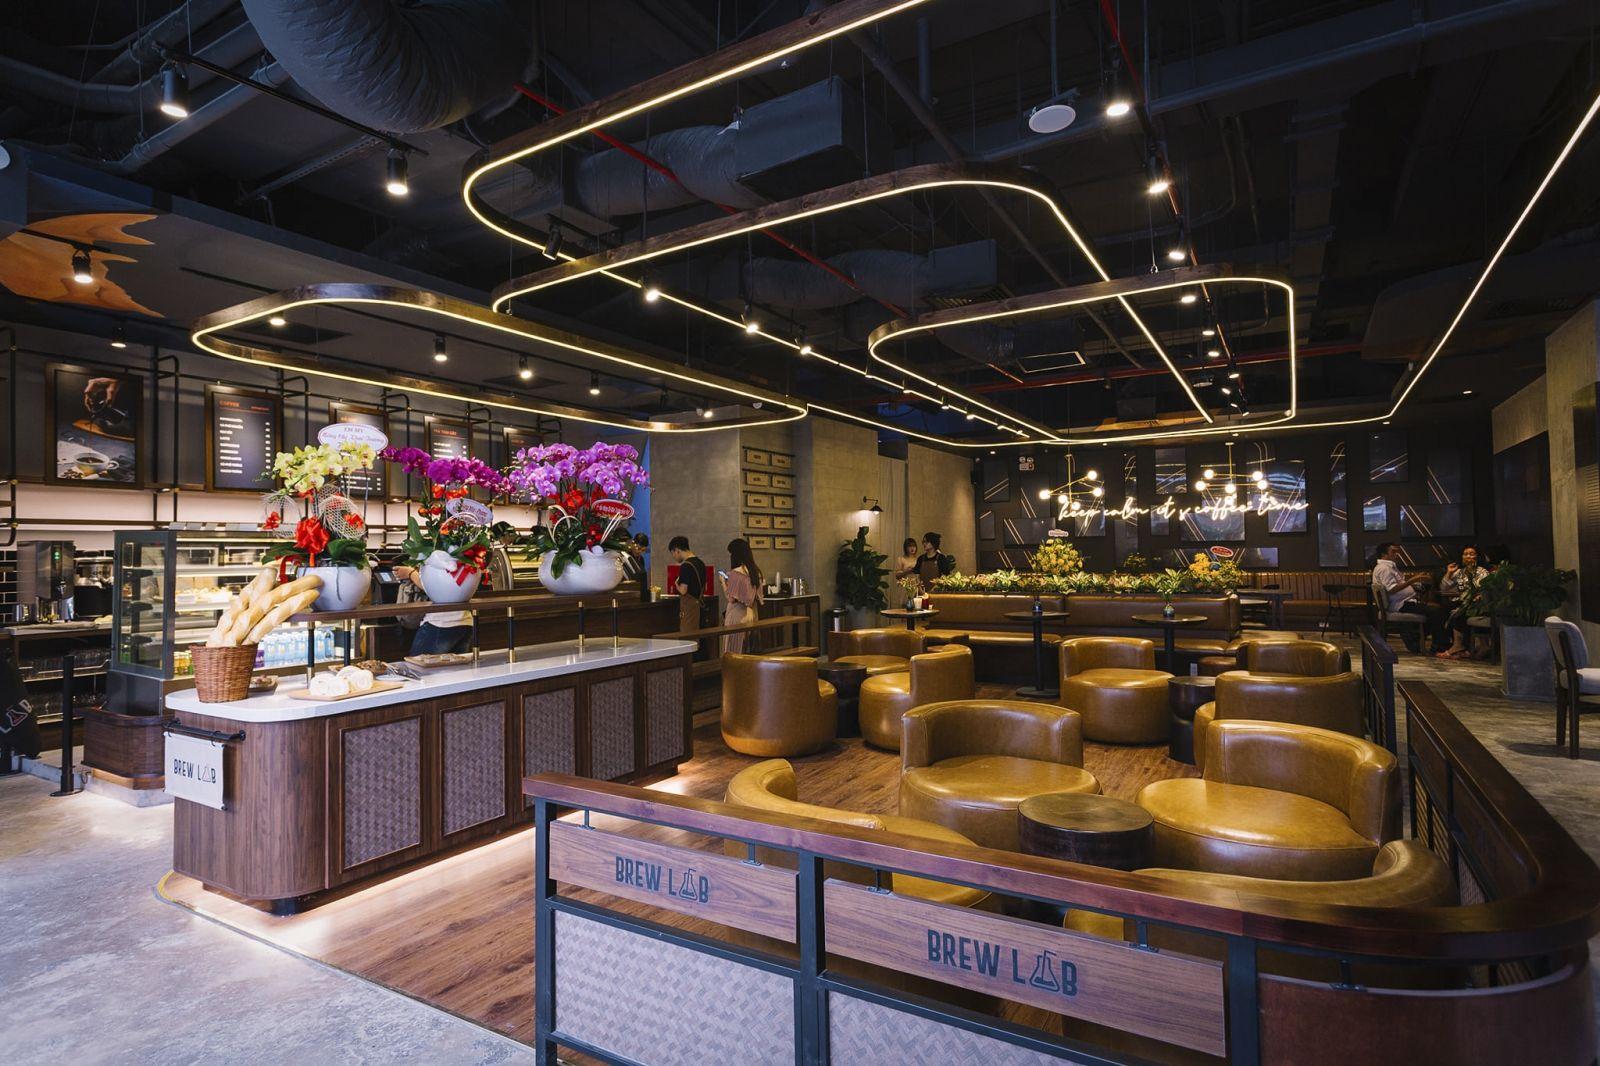 thi-cong-hoan-thien-quan-cafe-brewlab-10